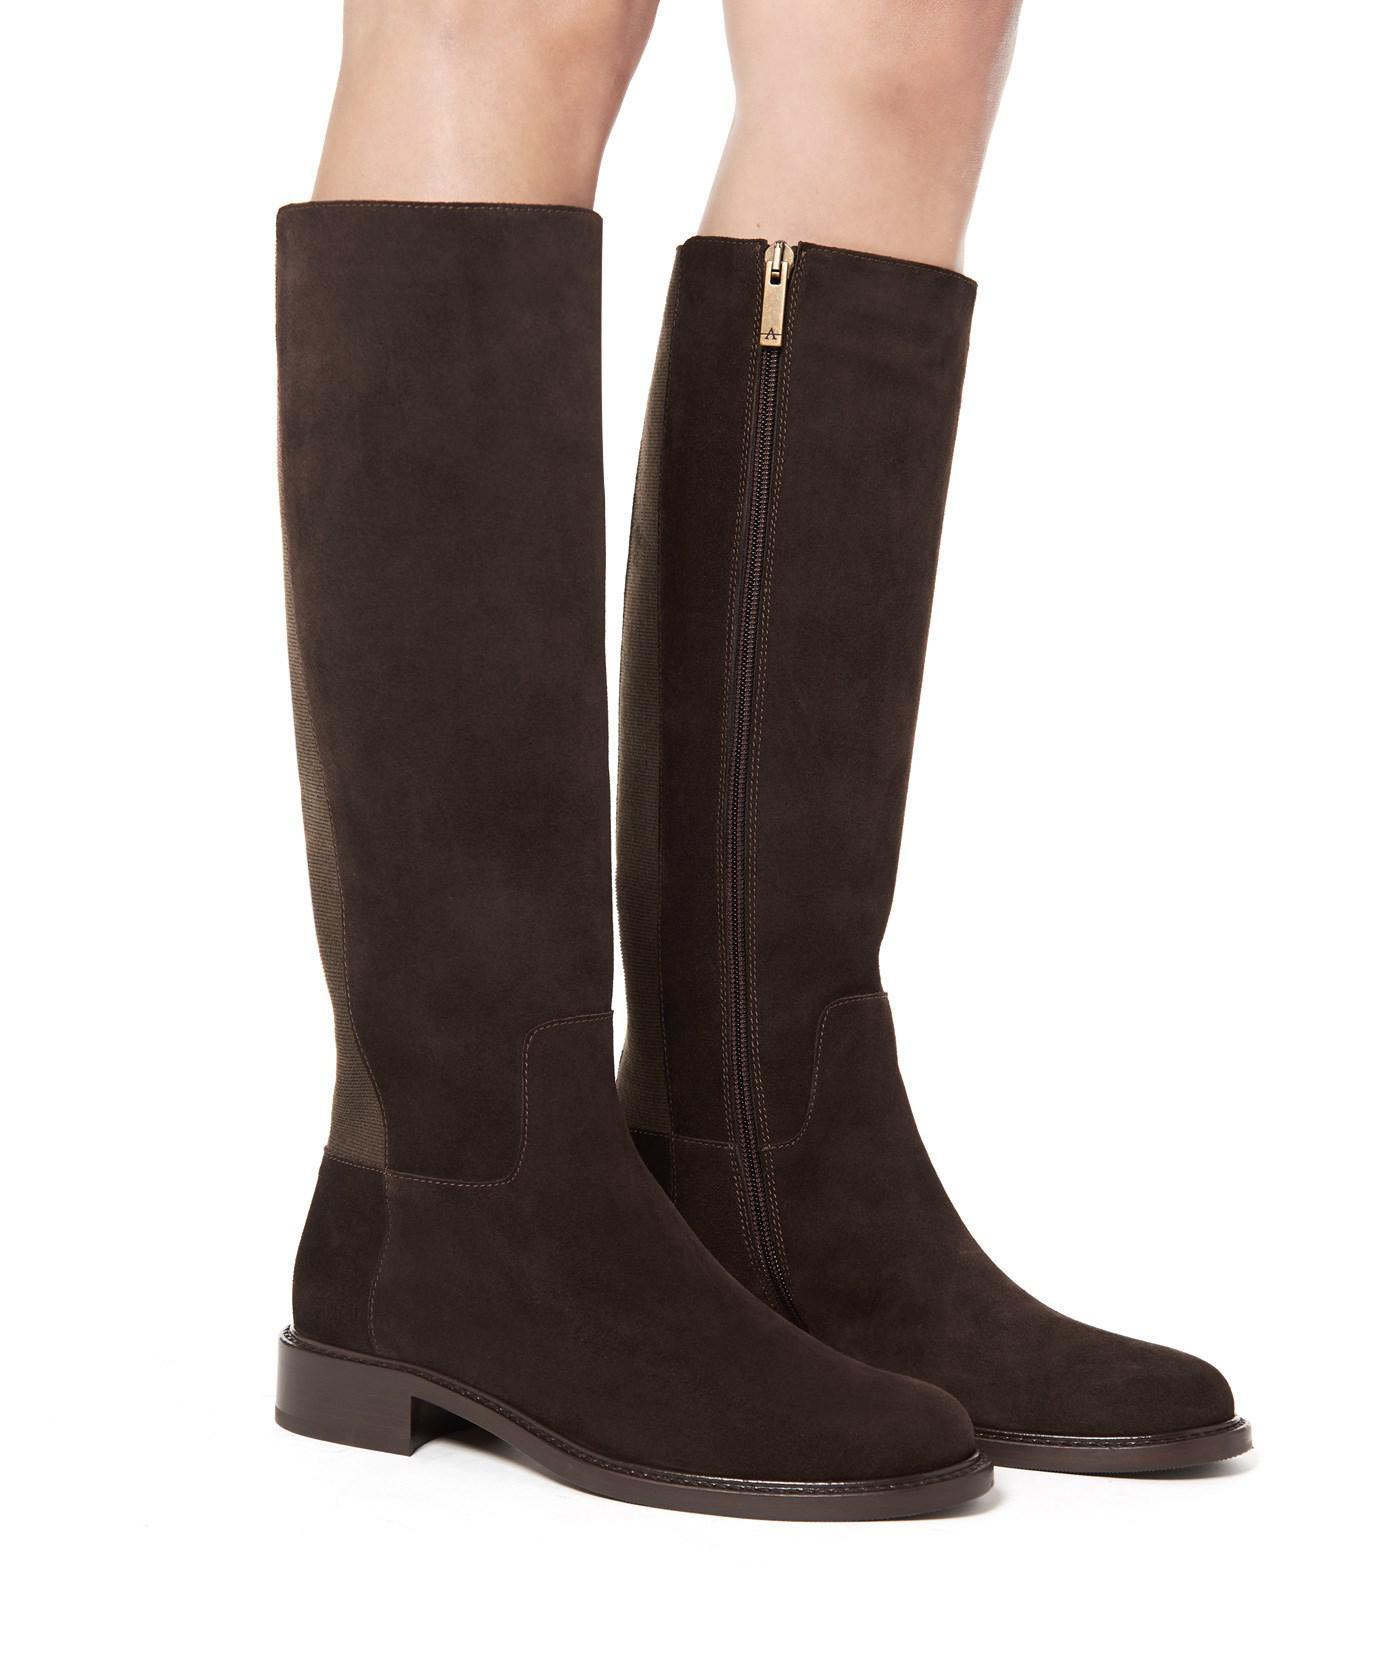 Aquatalia Women's Bryana Weatherproof Leather Tall Boots lLkQxL